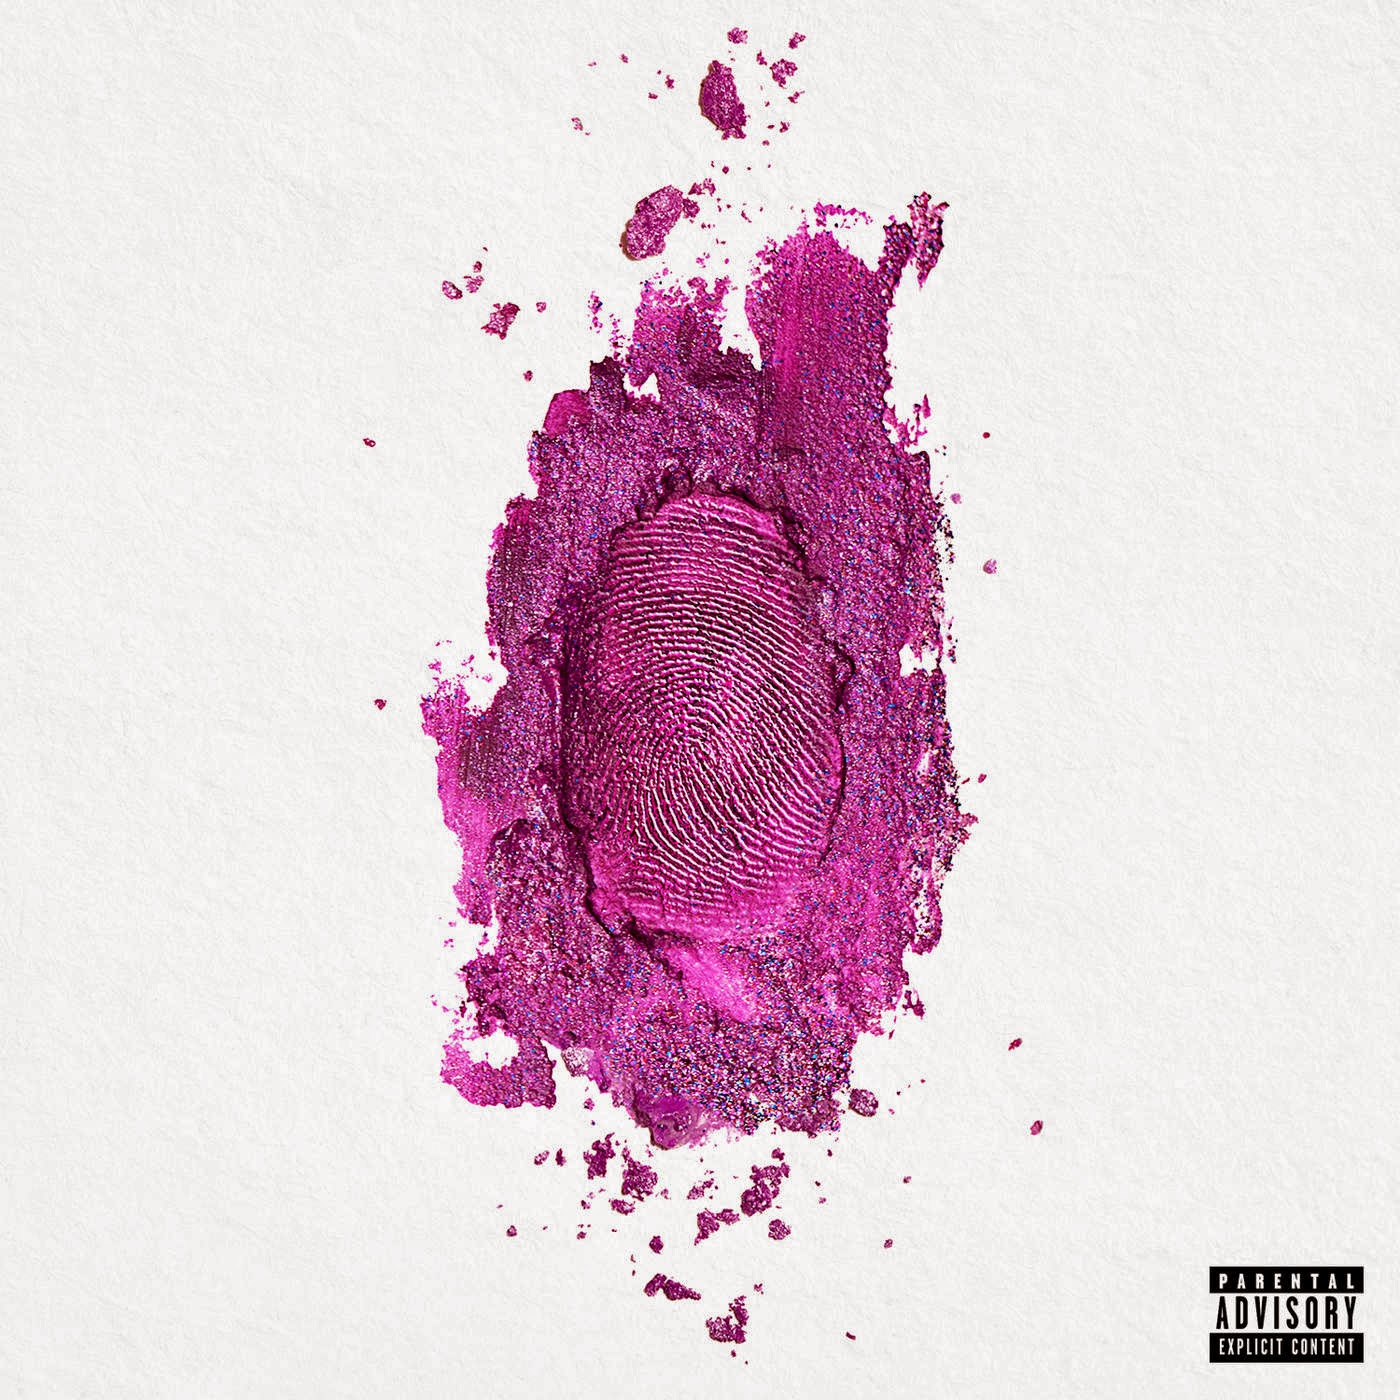 Nicki Minaj - The Pinkprint (Deluxe) Cover